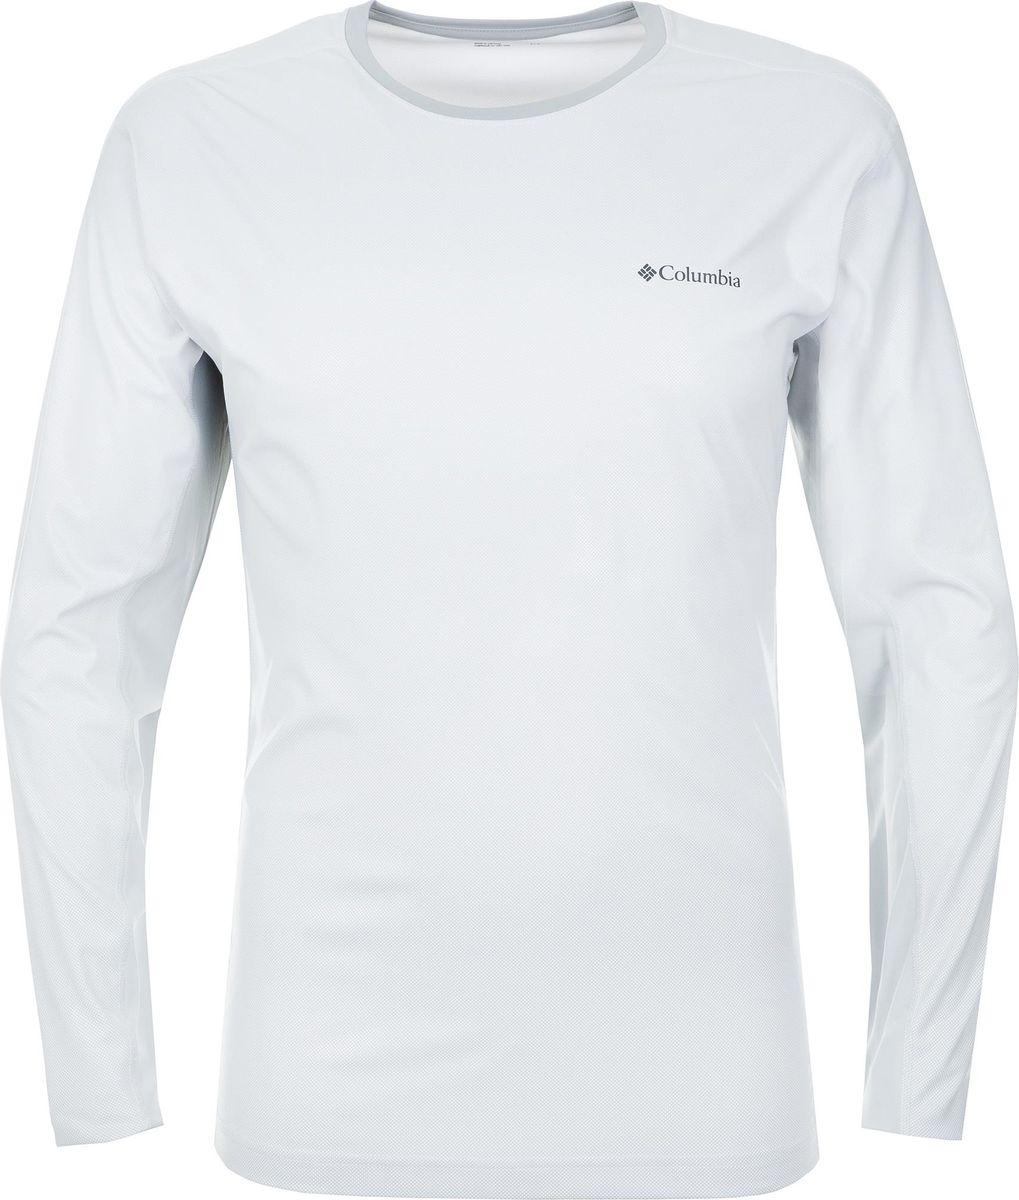 Лонгслив Columbia Solar Chill 2.0 Long Sleeve футболка с длинным рукавом asics 156859 0904 man long sleeve tee